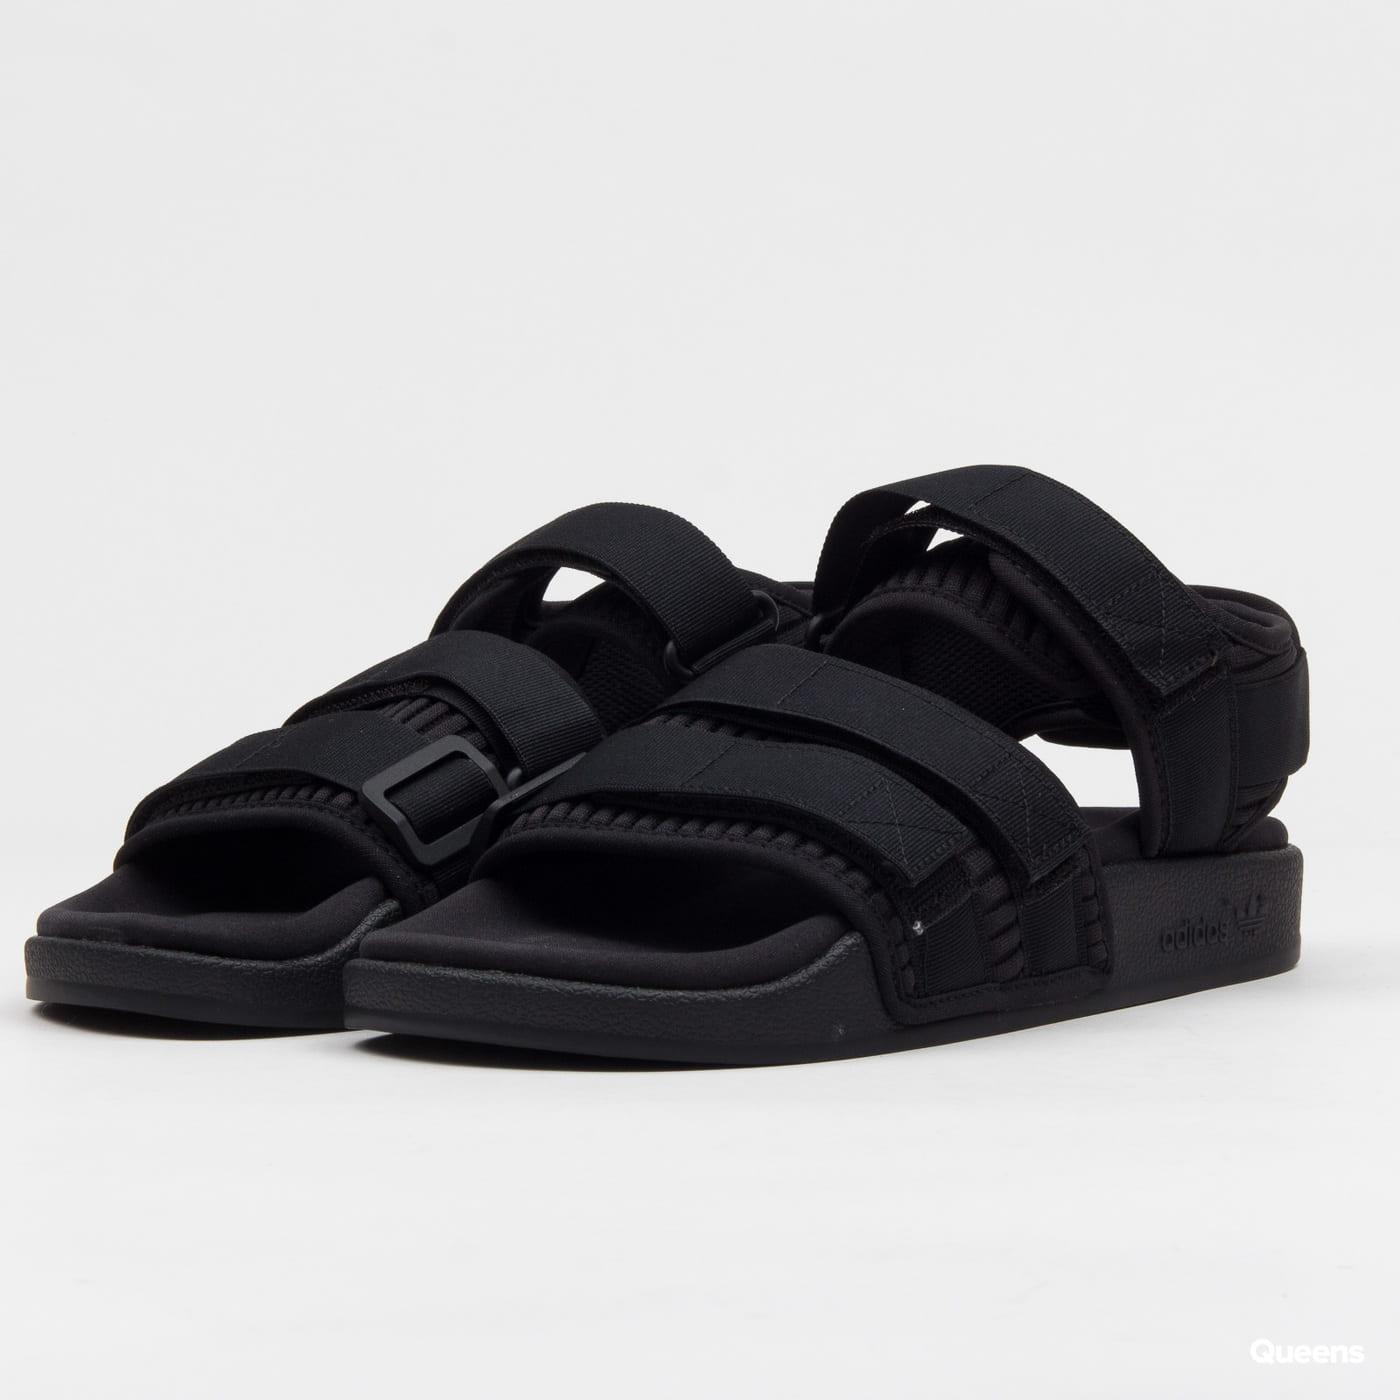 4e99a250 Sandals adidas Originals Adilette Sandal 2.0 W cblack / cblack / cblack  (CG6623) – Queens 💚